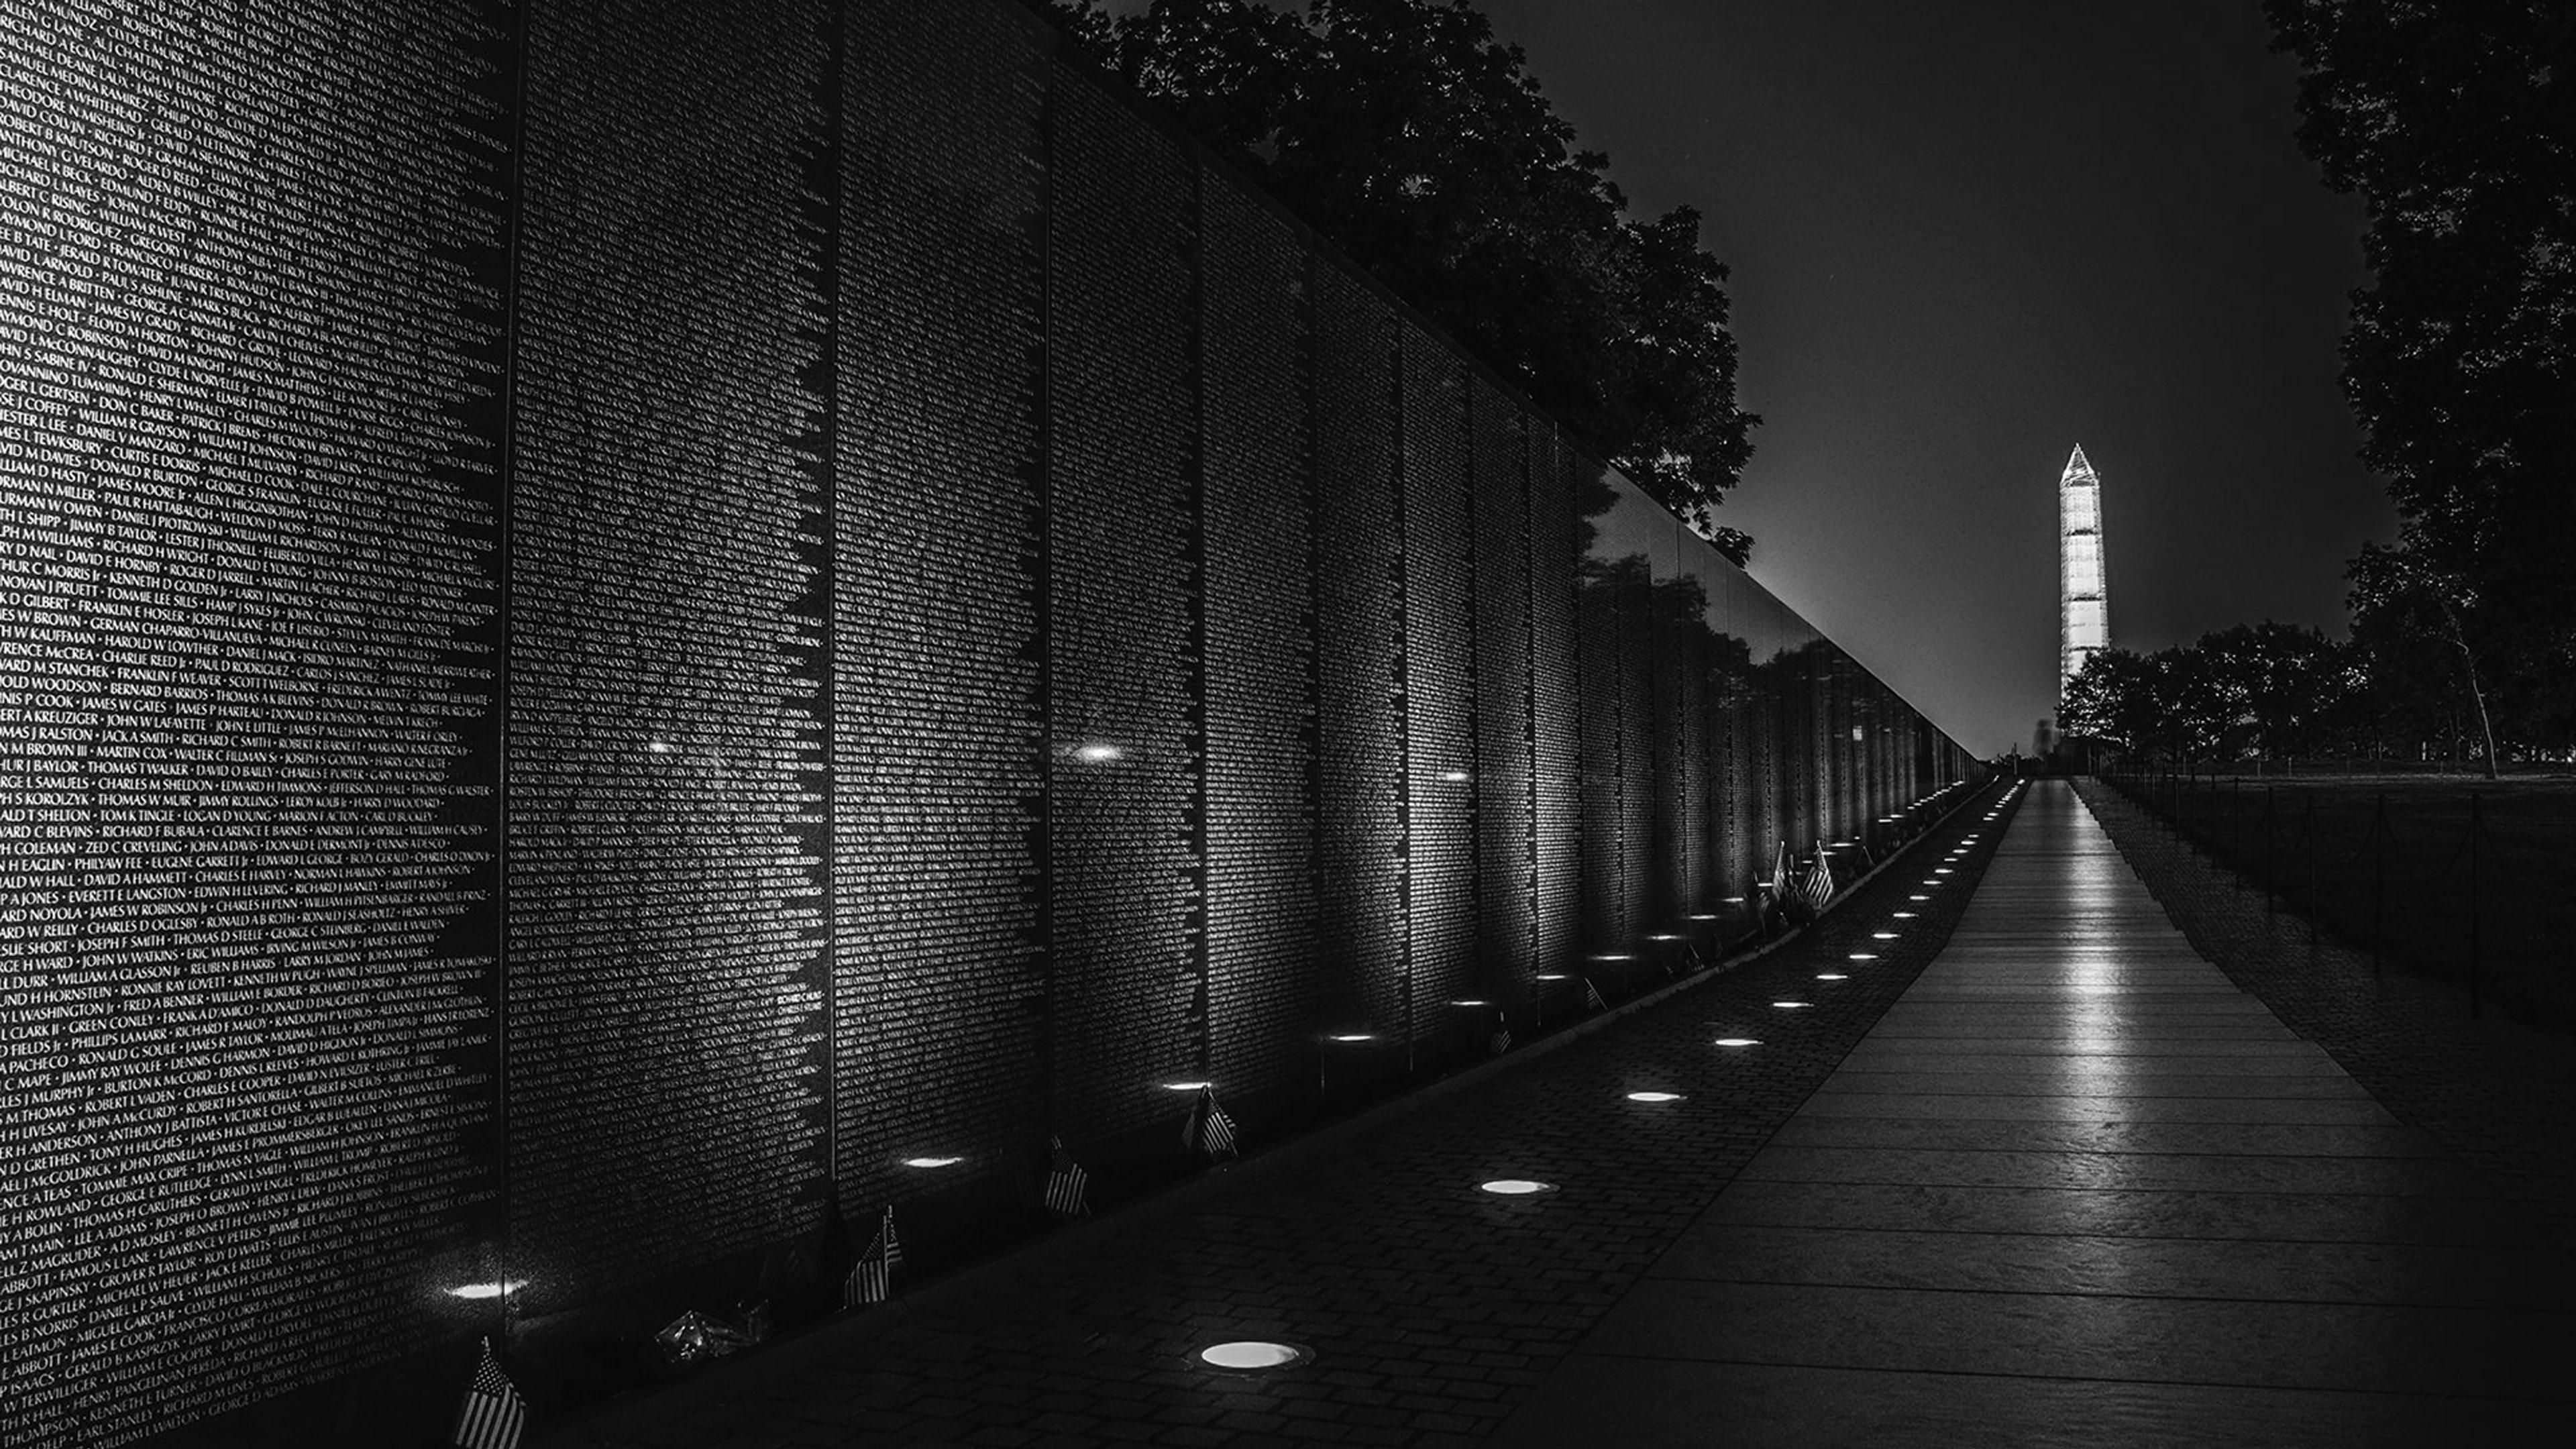 The Wall - Vietnam Veterans Memorial Fund